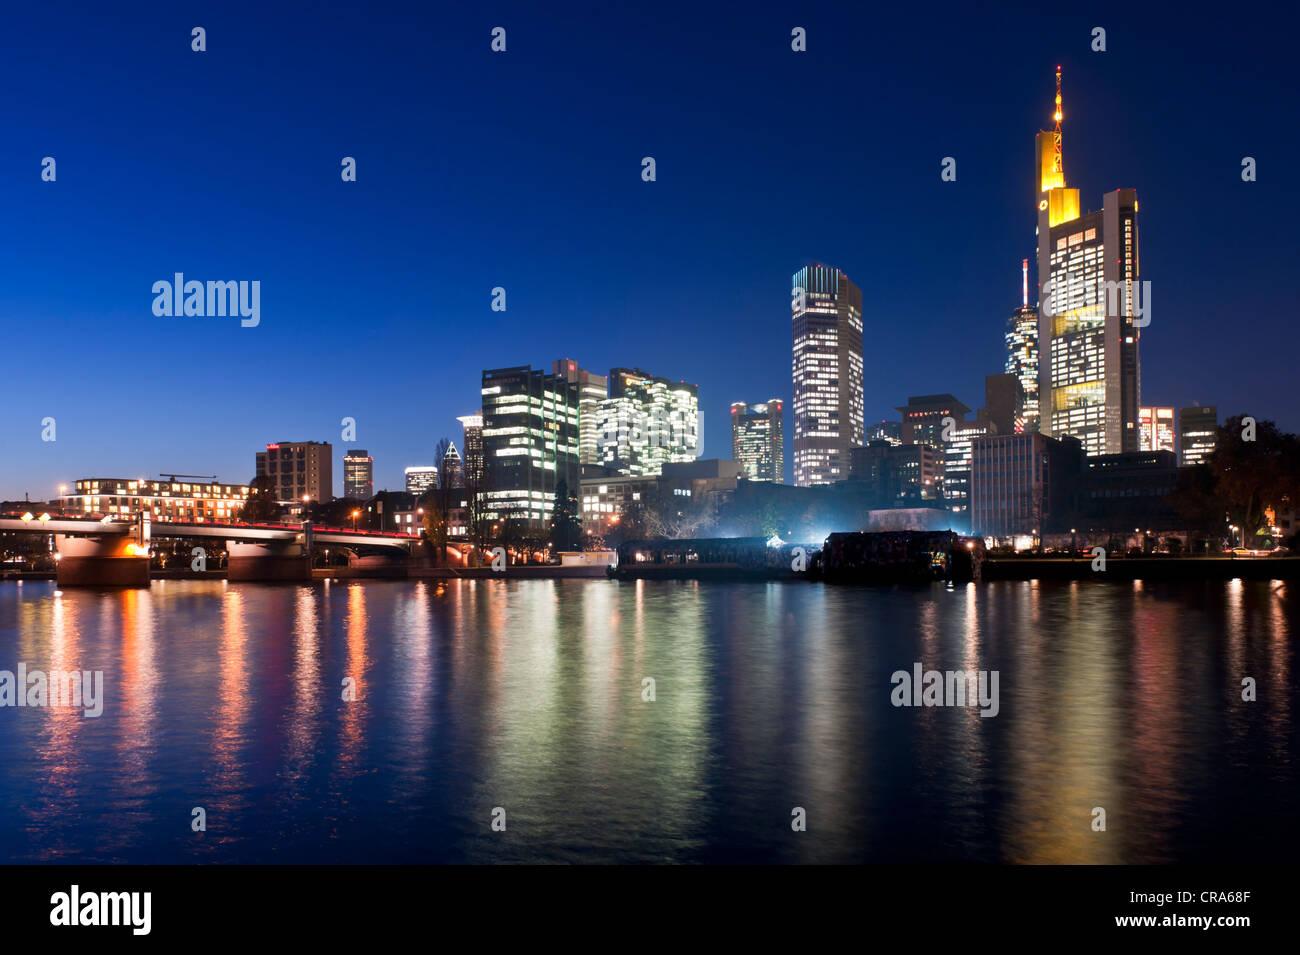 Skyline of the Bankenviertel financial district at dusk, Frankfurt am Main, Hesse, Germany, Europe - Stock Image